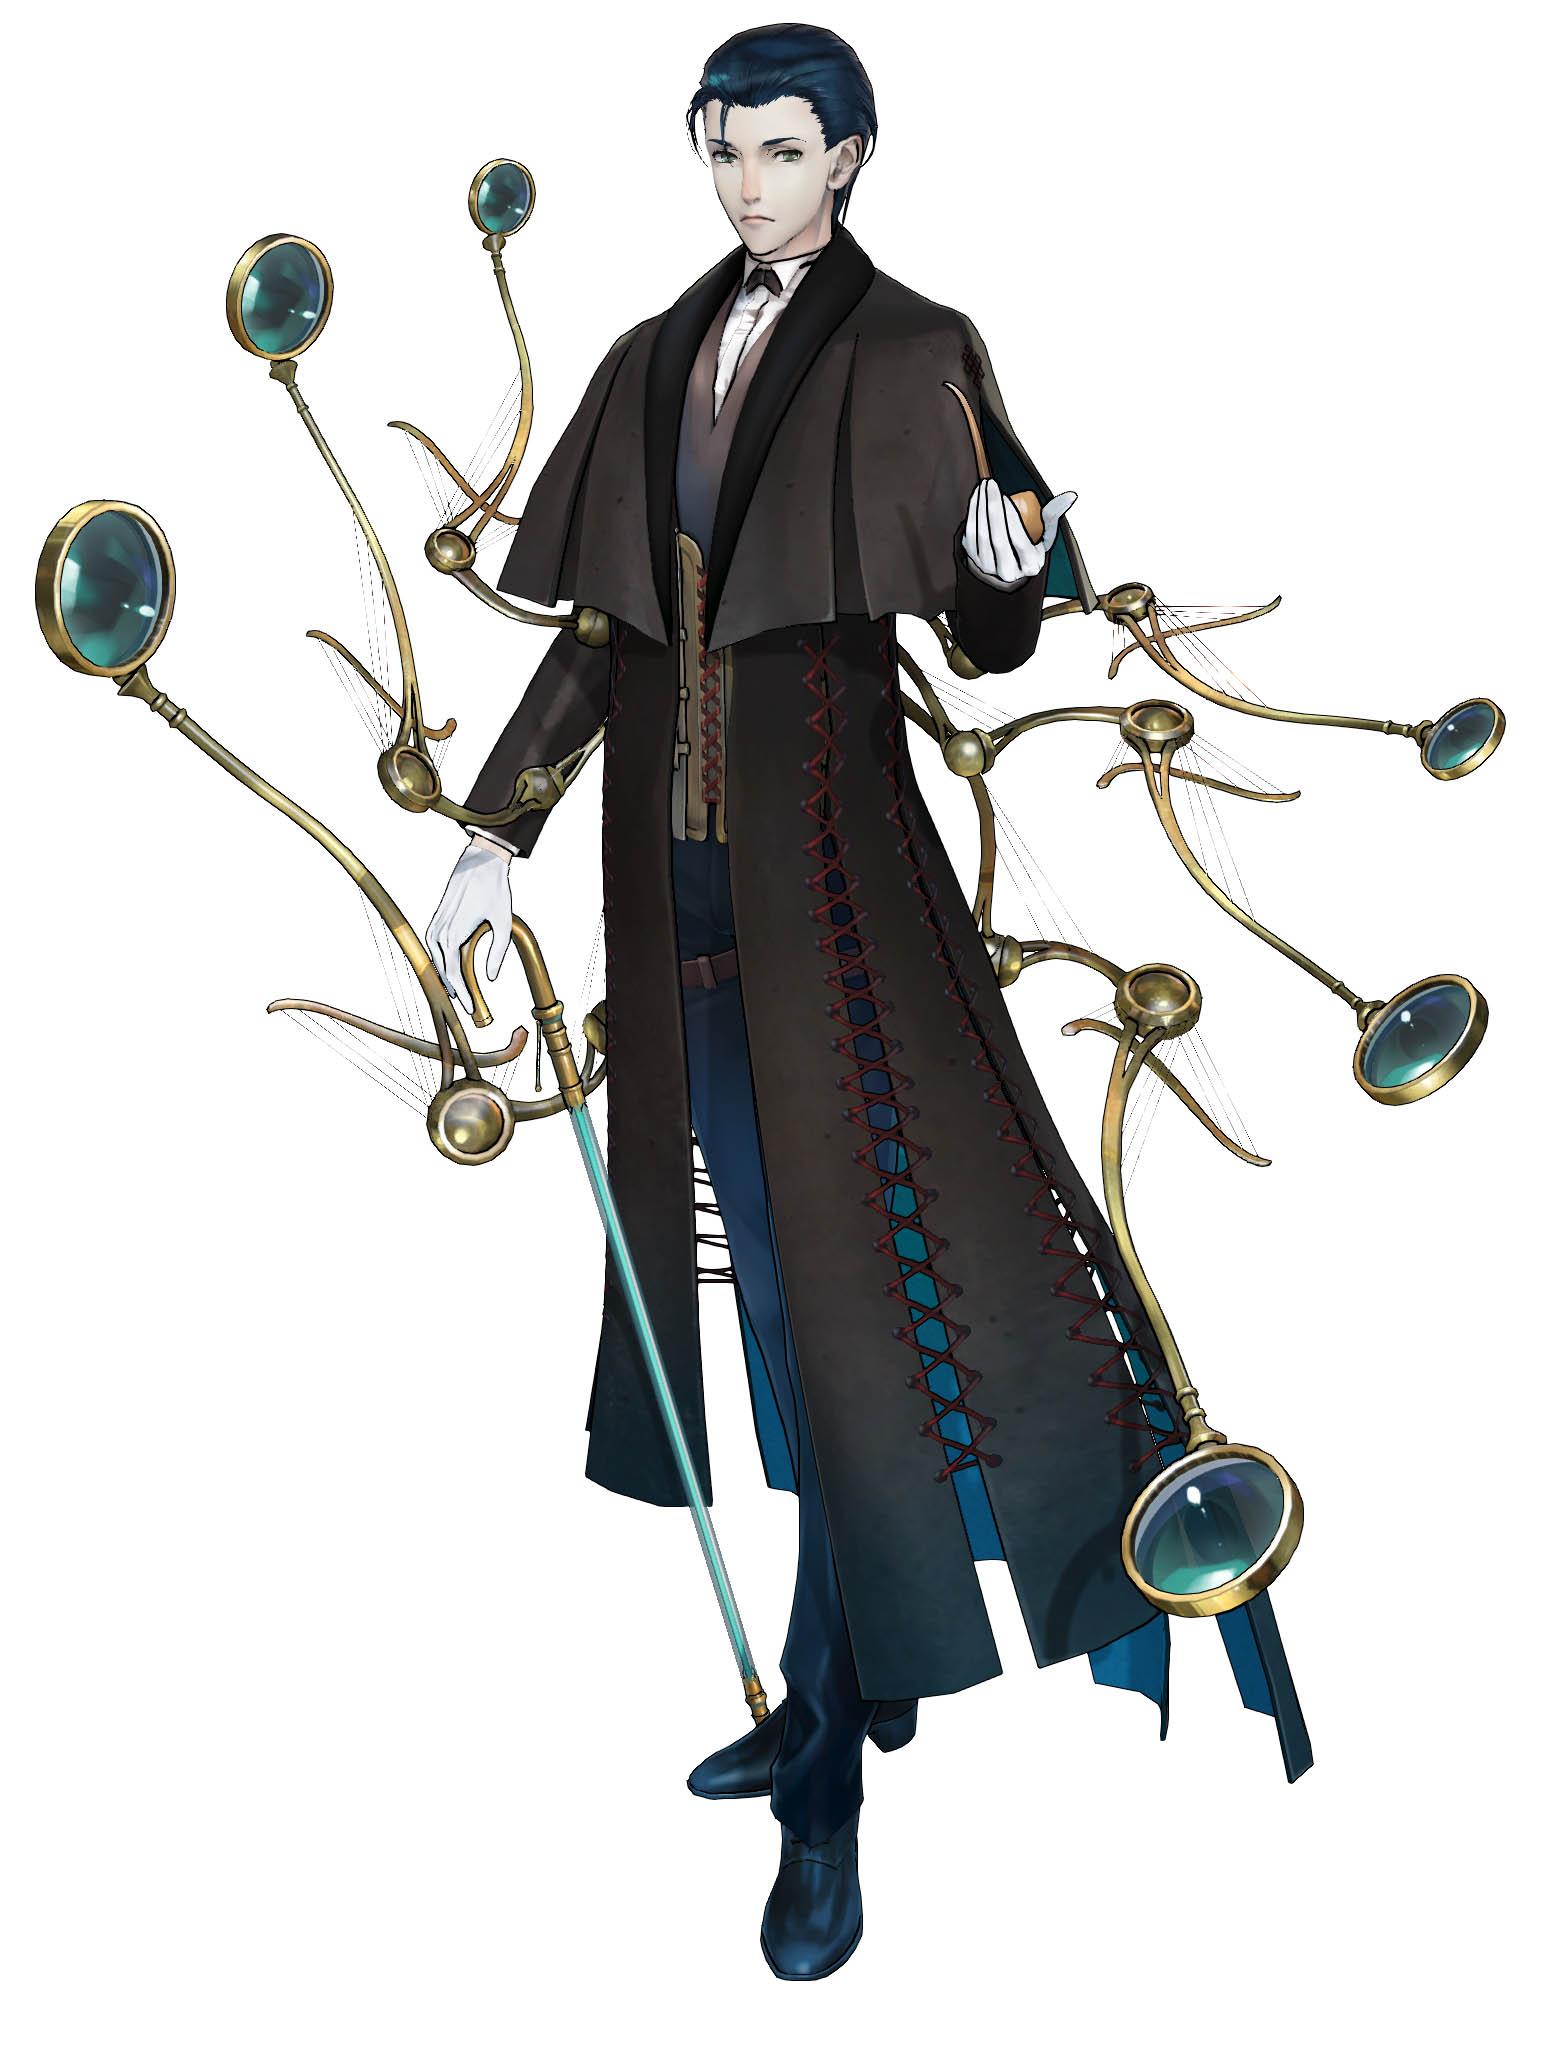 「Fate/Grand Order Arcade」シャーロック・ホームズ_3DCG_第2段階